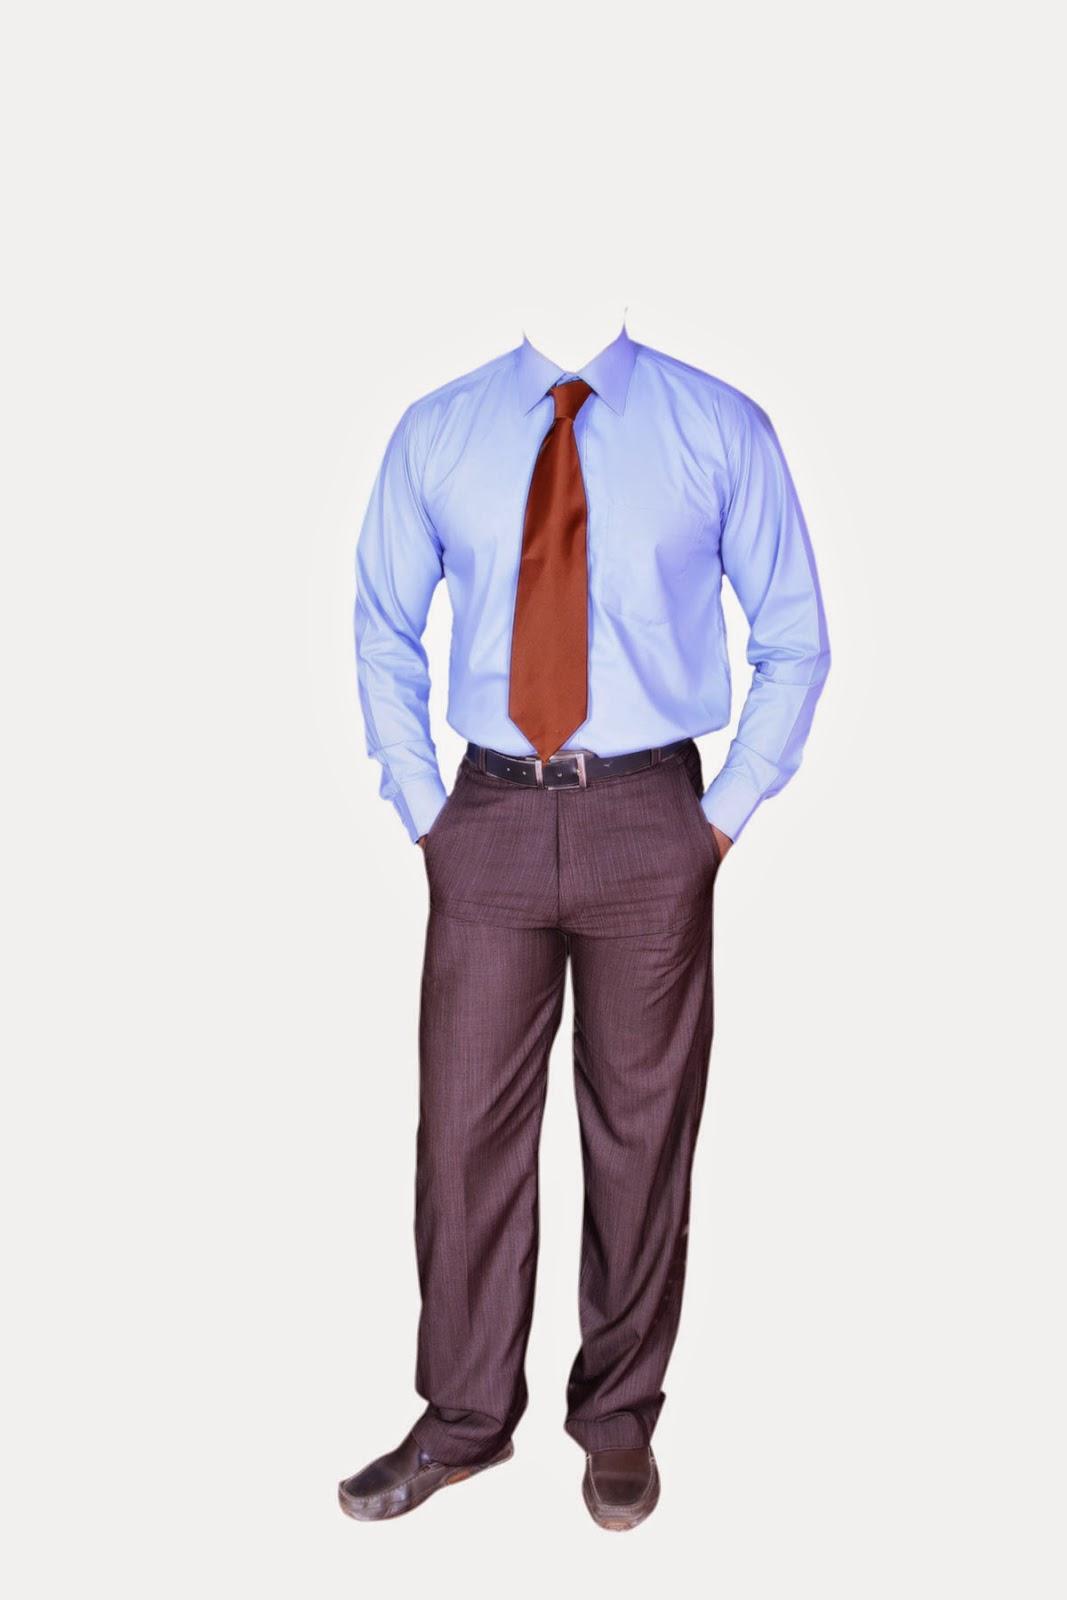 Man Dress PSD Image Download